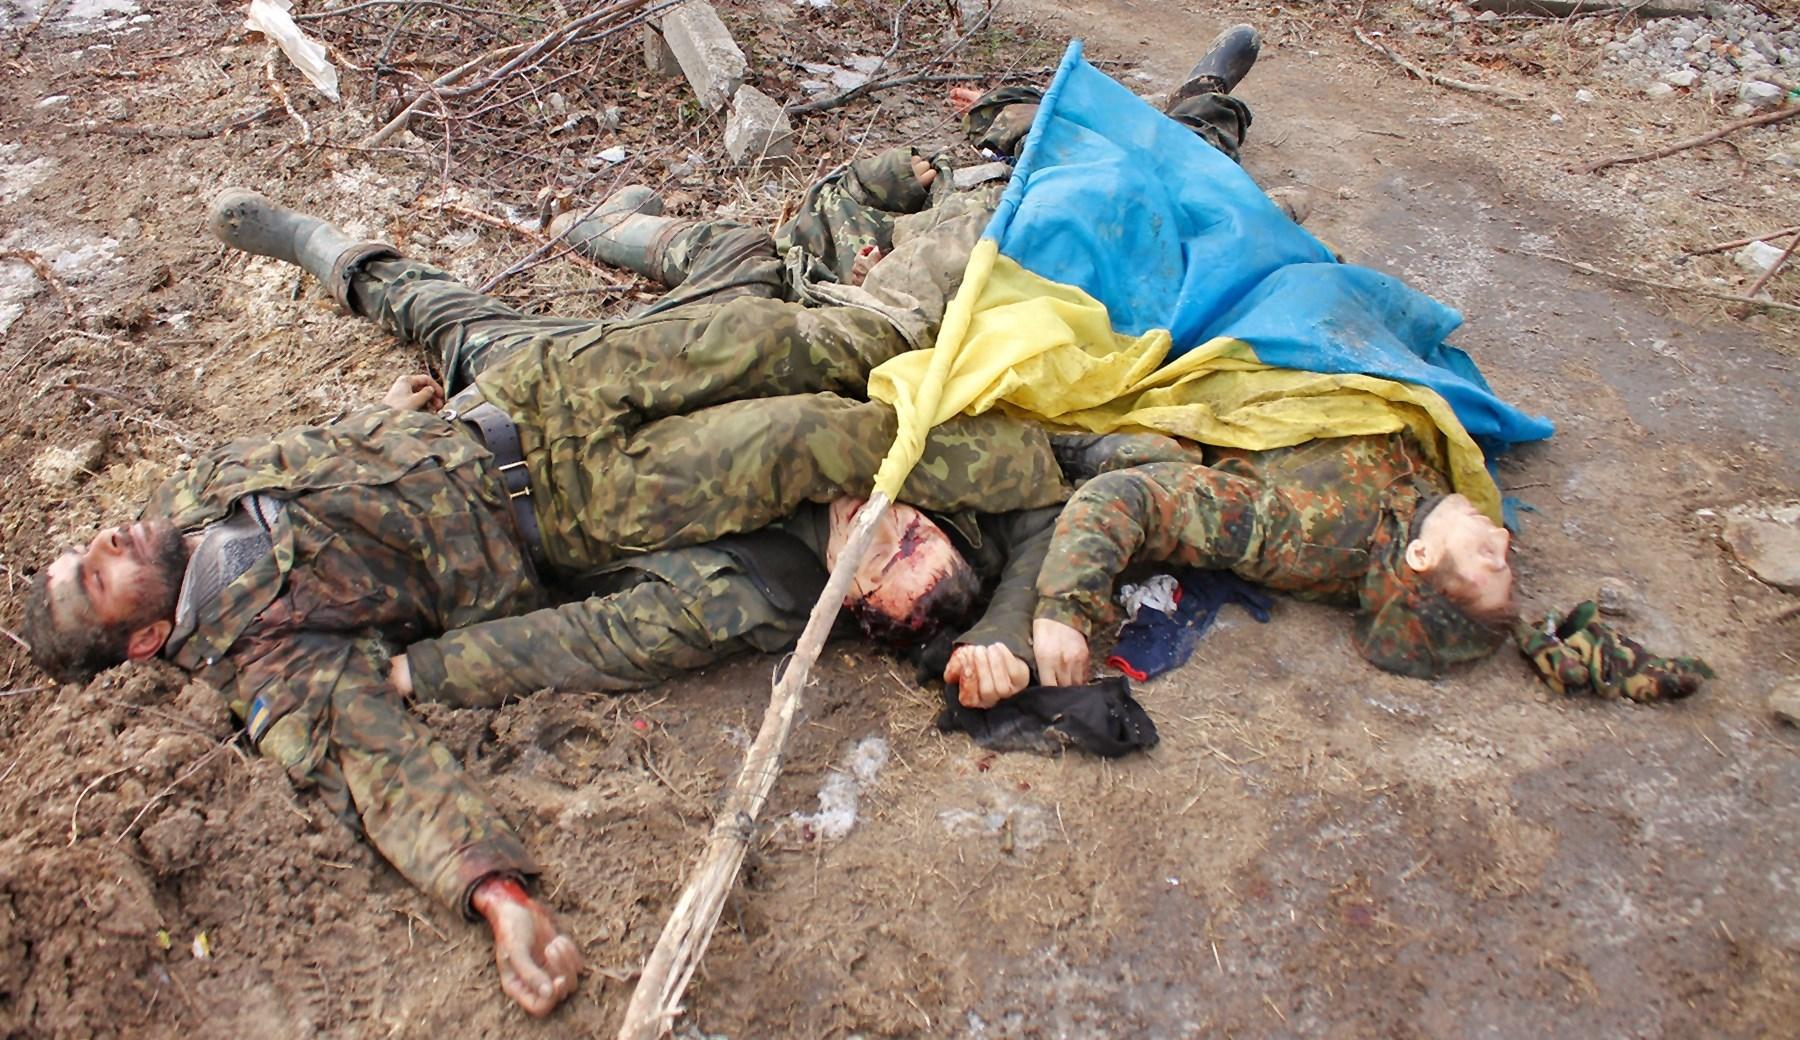 00 dead ukrainian soldiers, Krasny Partizan 01. 06.06.15